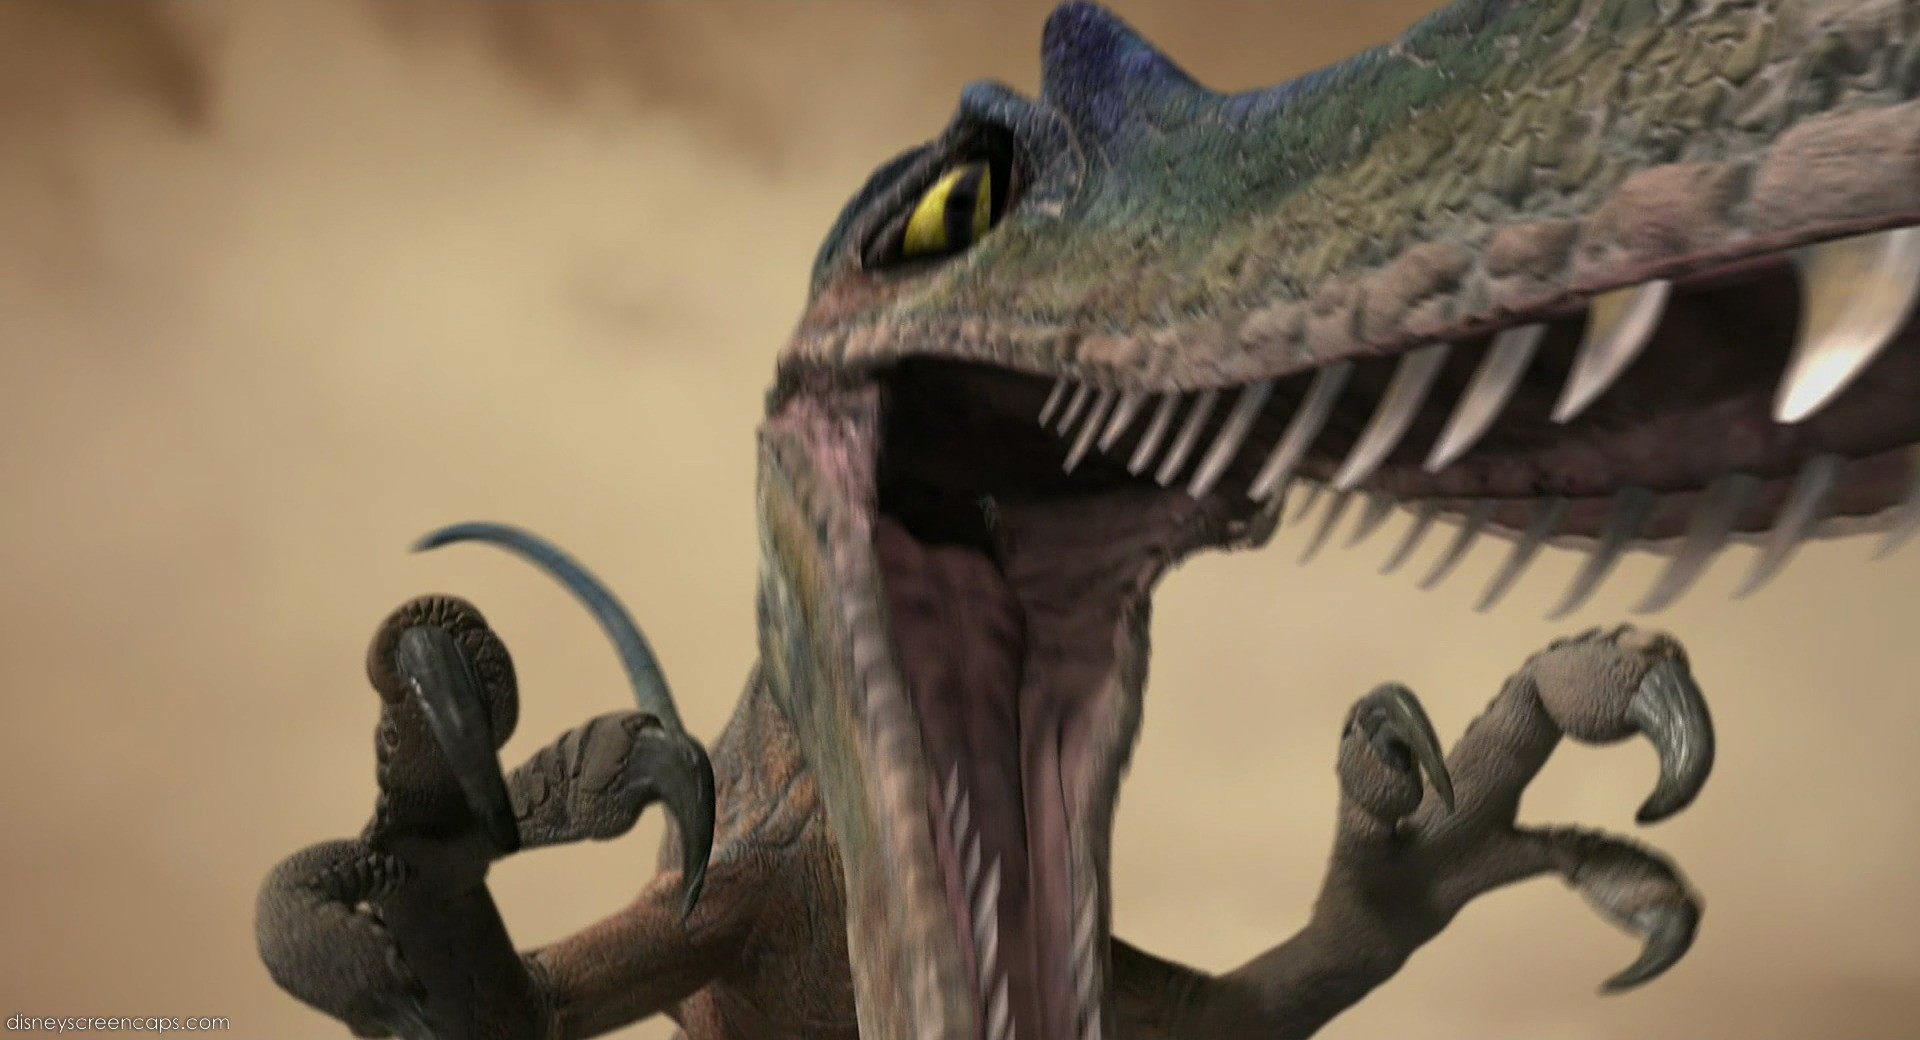 valocaraptor bad movies u2013 Page 2 u2013